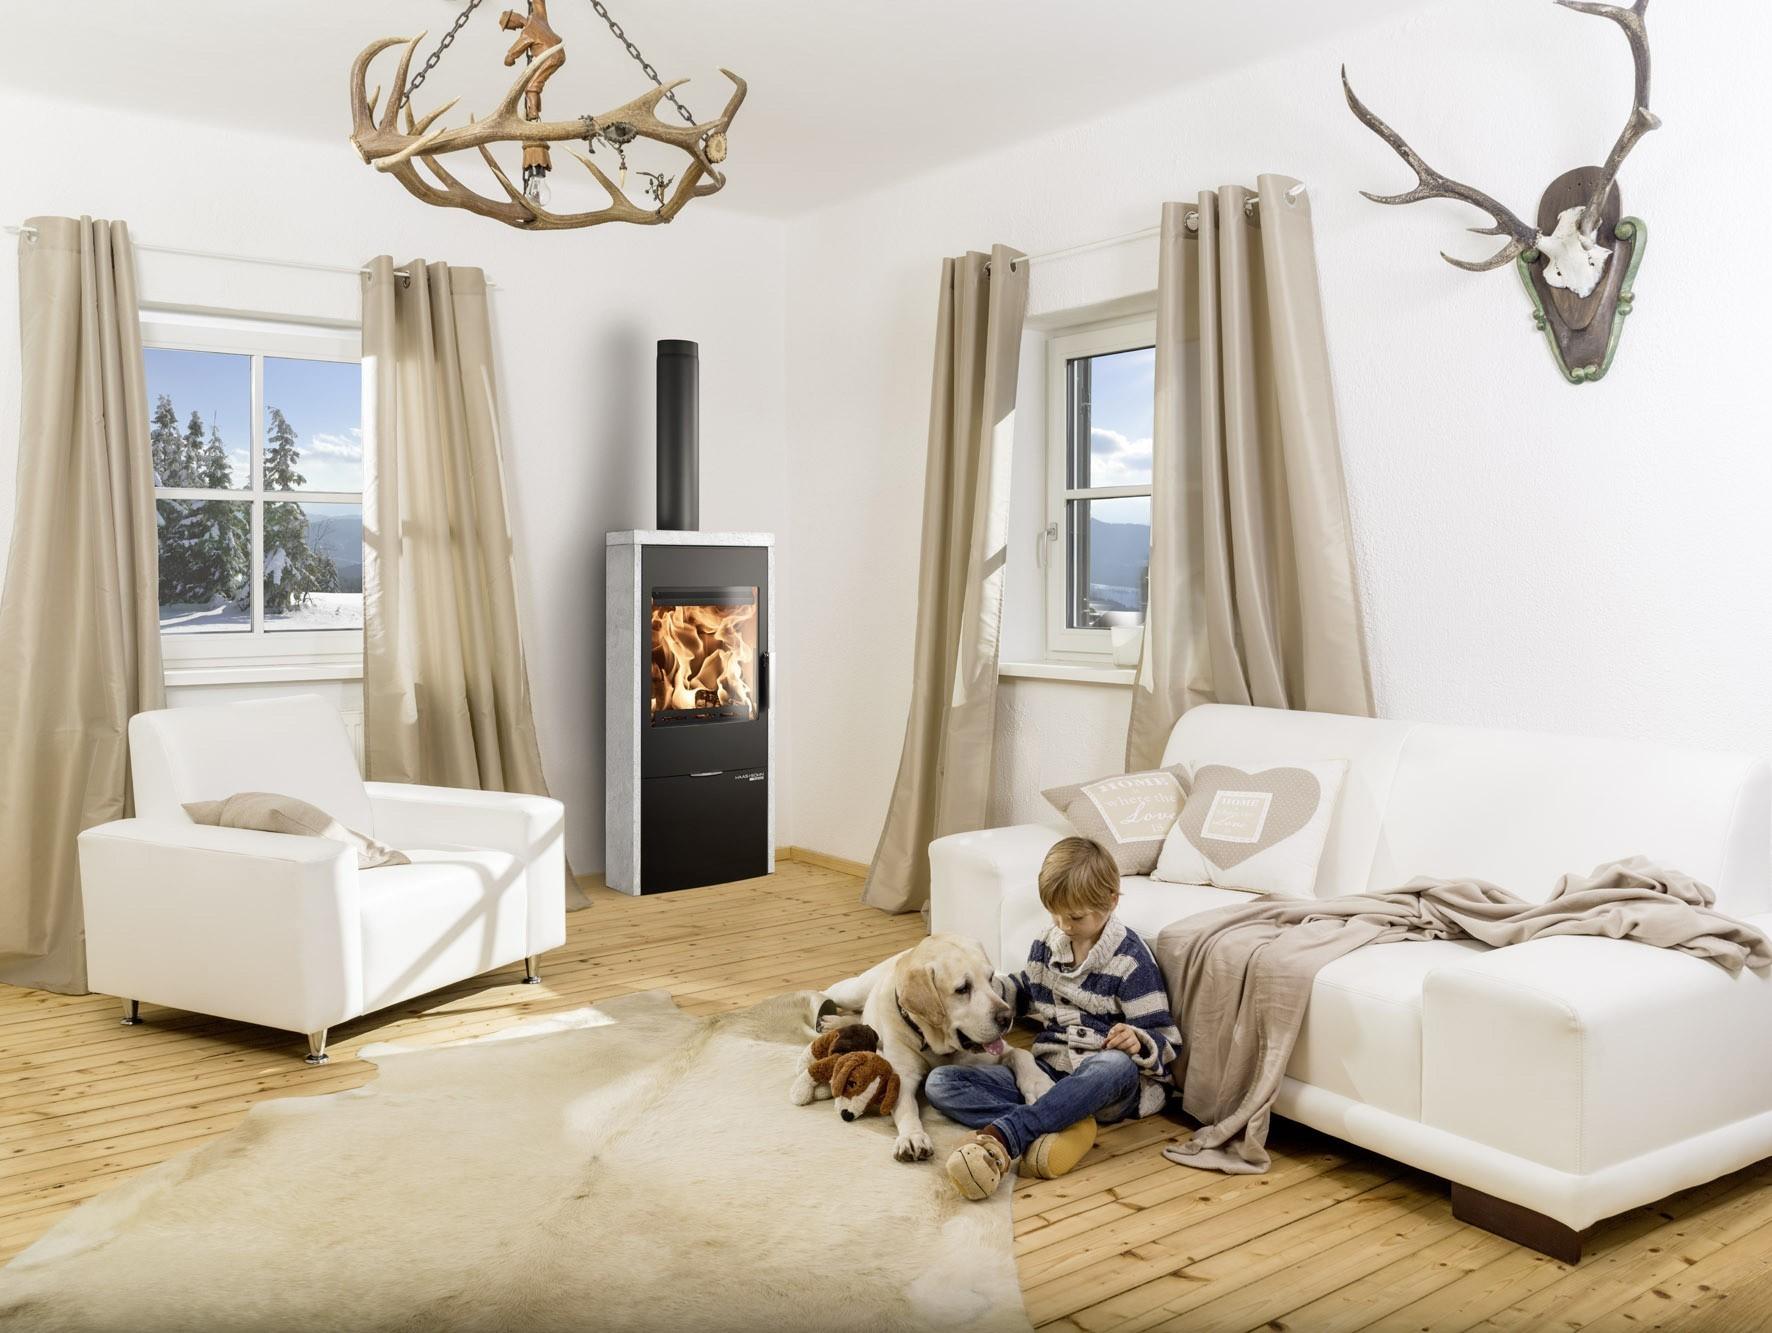 kaminofen dauerbrandofen haas sohn lausitz easy 6kw bei. Black Bedroom Furniture Sets. Home Design Ideas